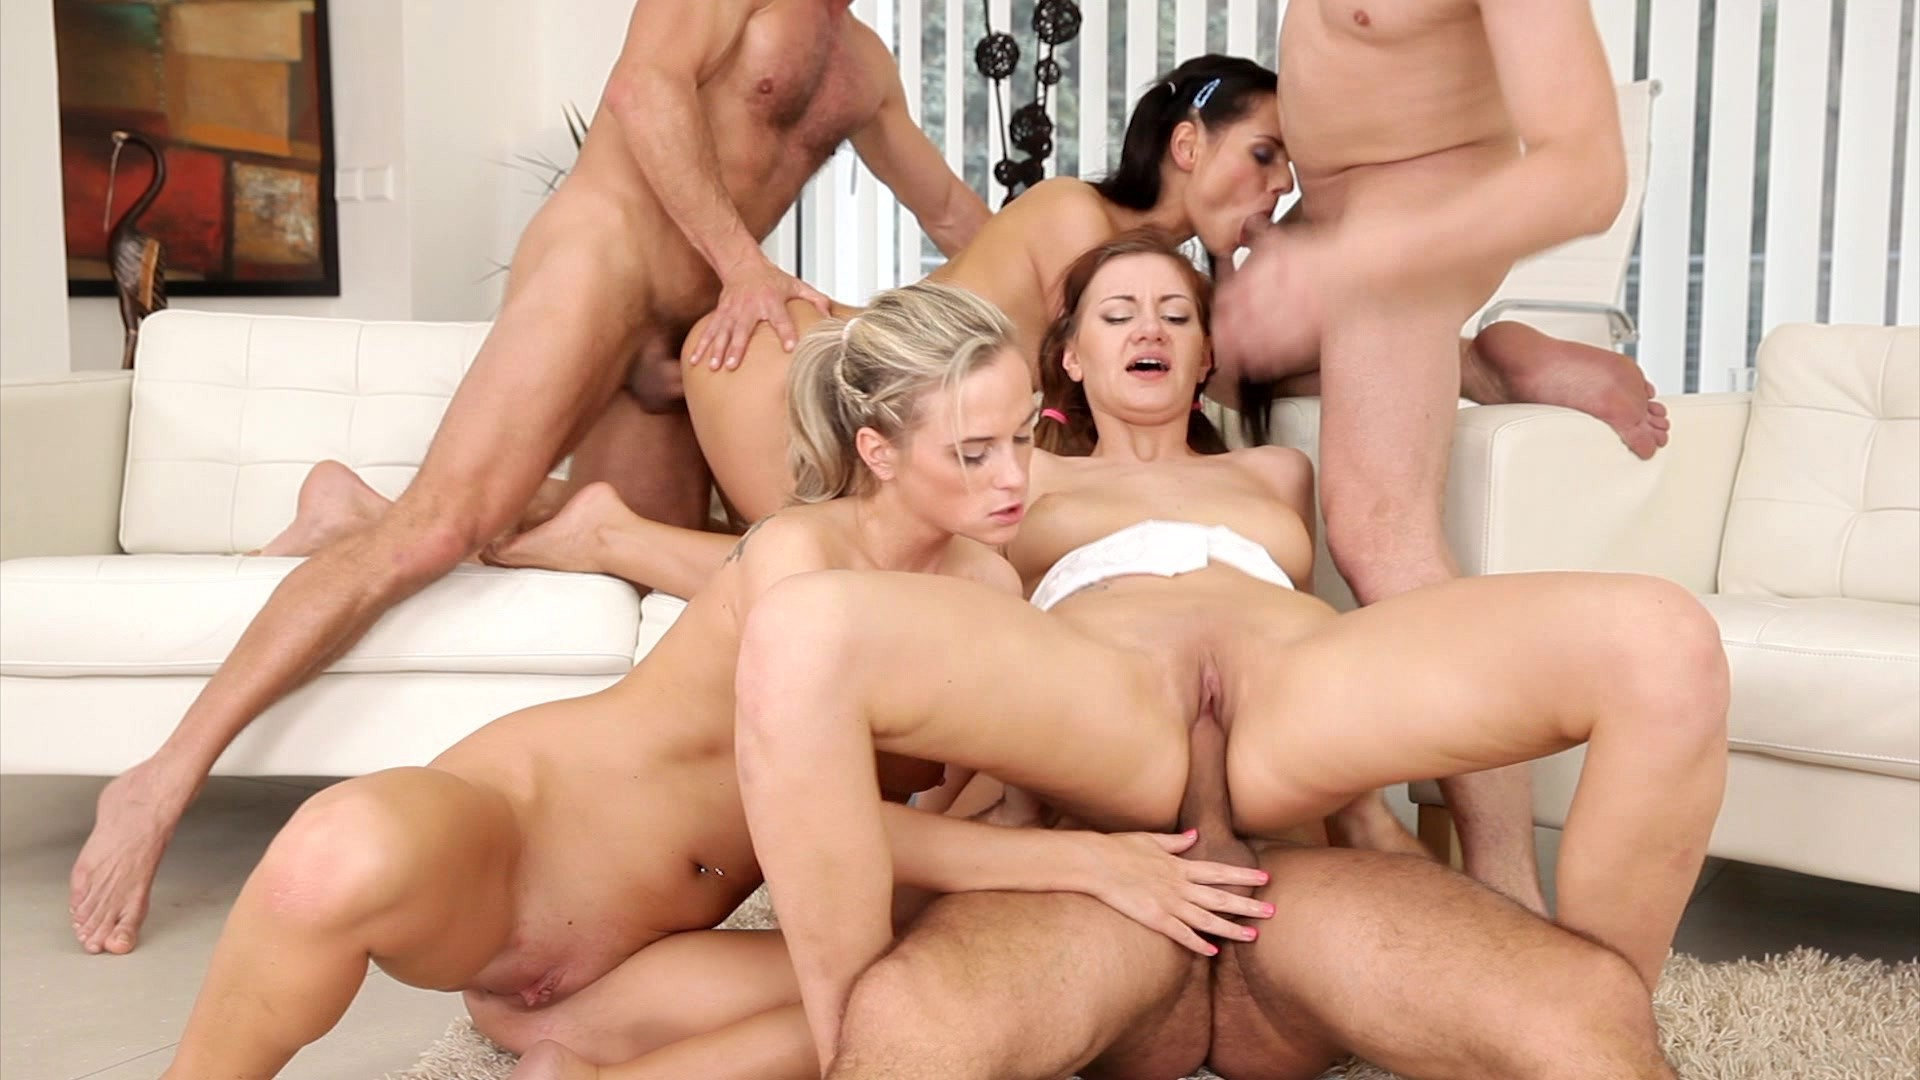 Swinger sex orgies dvds